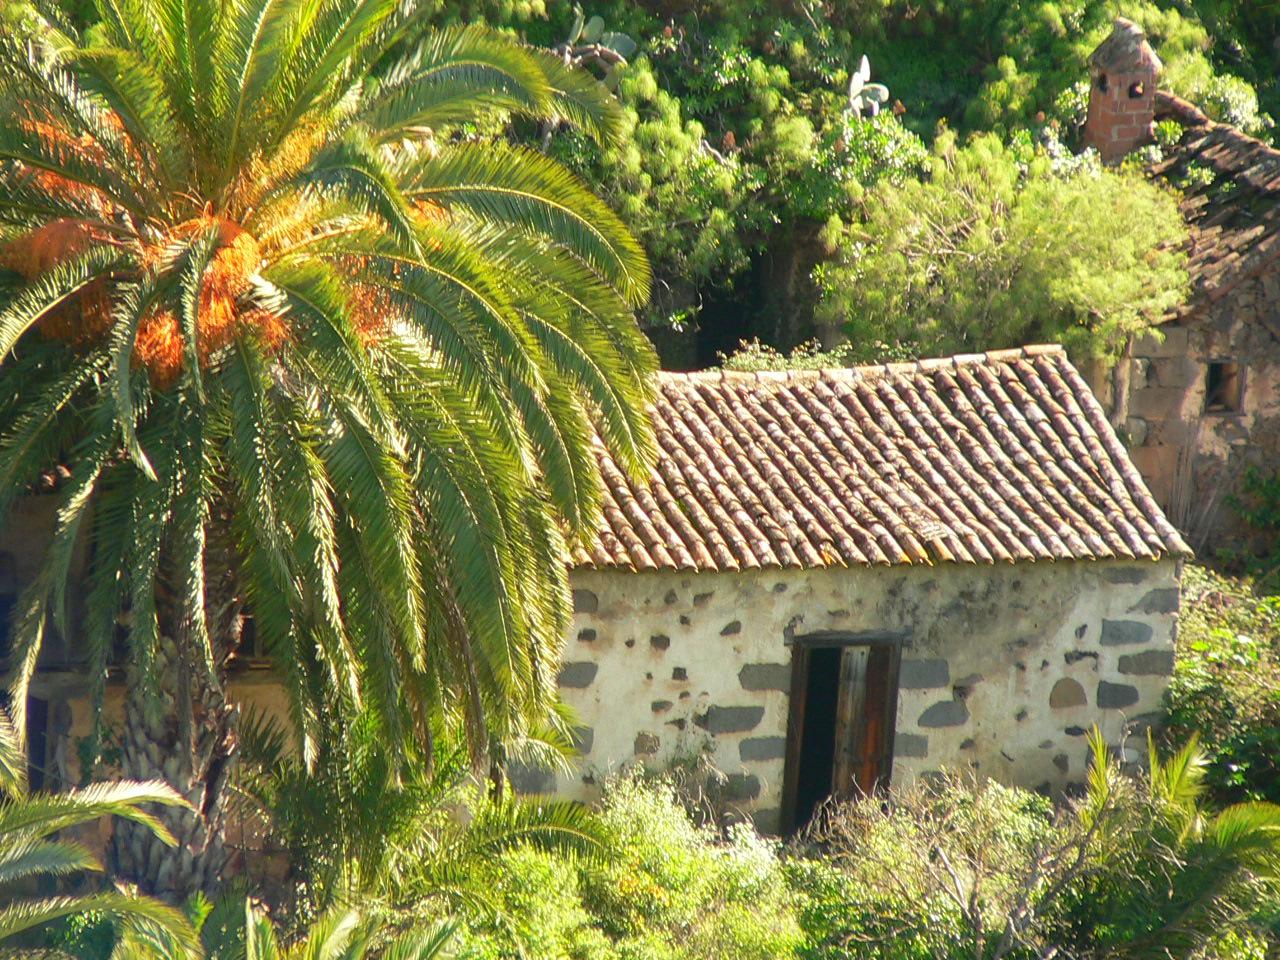 File:Casa canaria medianias santa brigida gran canaria.jpg - Wikimedia Commons